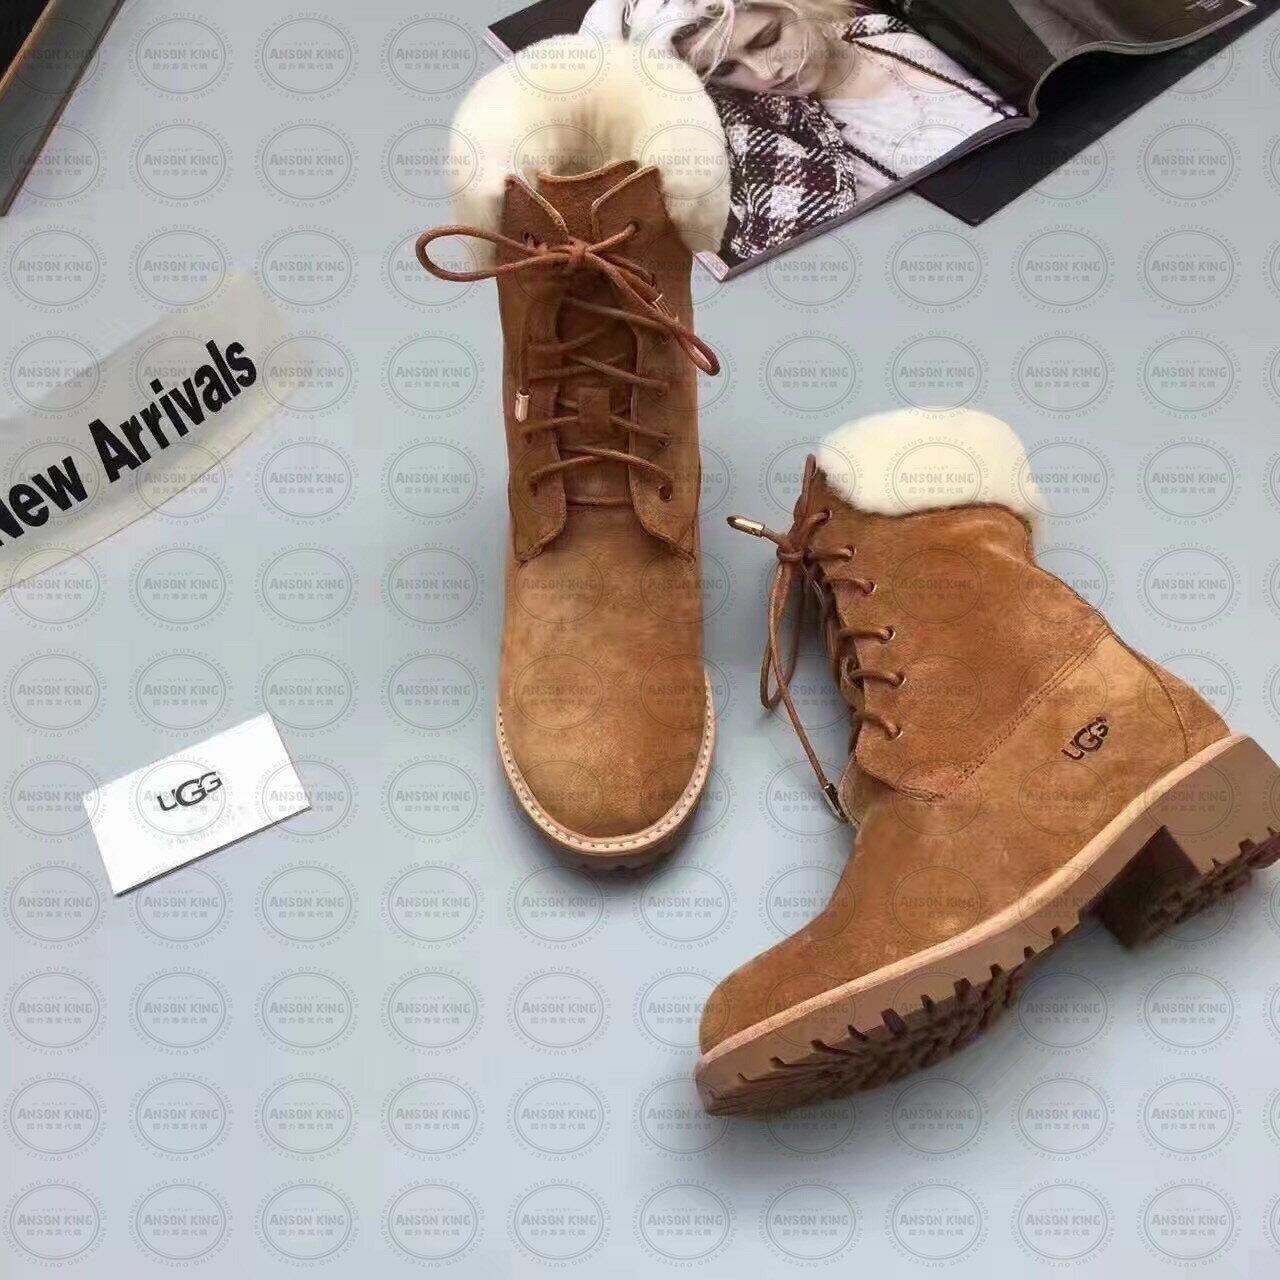 OUTLET正品代購 澳洲 UGG 女款經典復古翻毛 馬汀靴 中長靴 保暖 真皮羊皮毛 雪靴 短靴 棕色 1